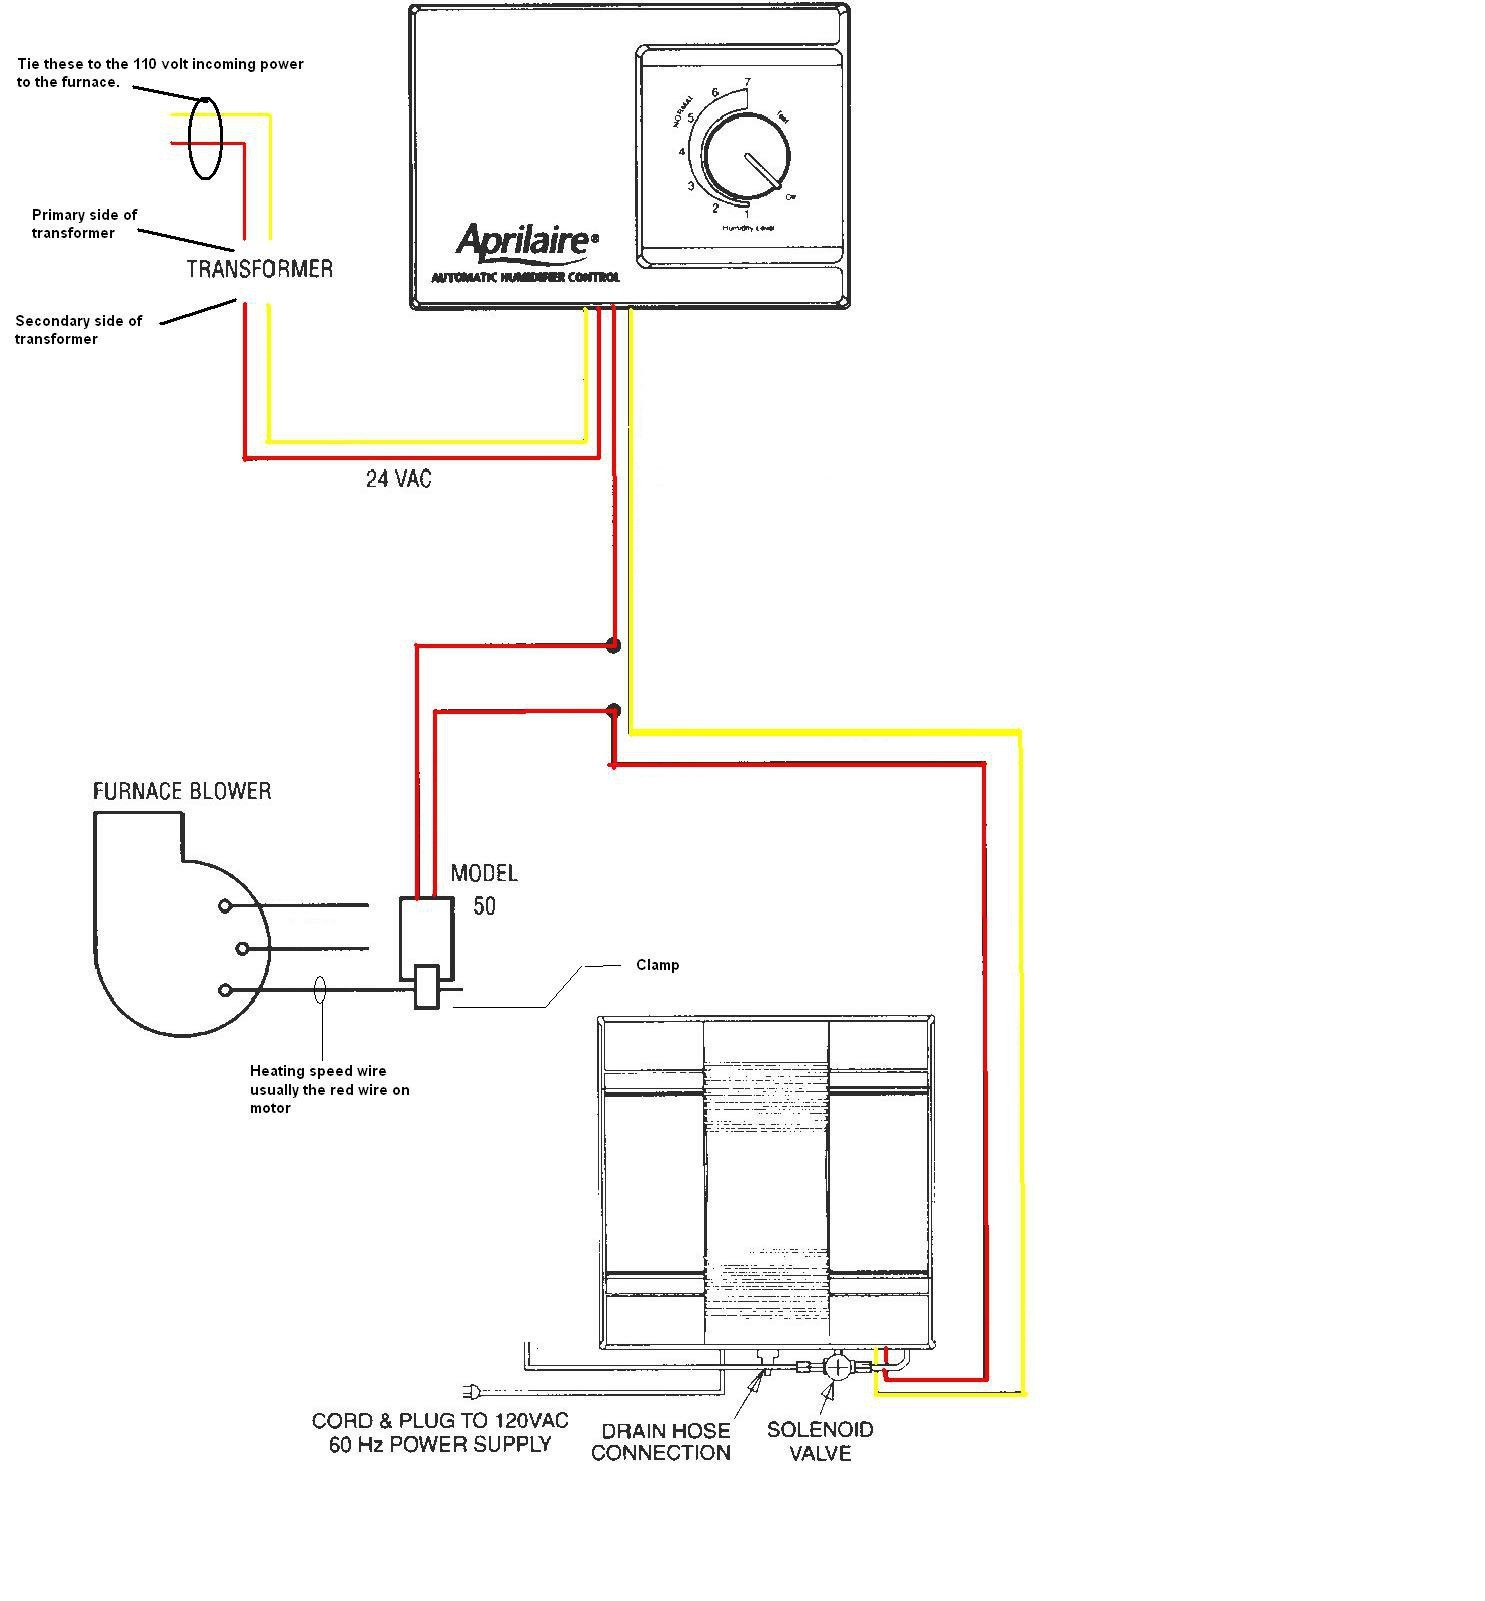 honeywell power humidifier wiring diagram Collection Ecobee Wiring Diagram Fresh Ecobee Wiring Diagram Beautiful Best DOWNLOAD Wiring Diagram